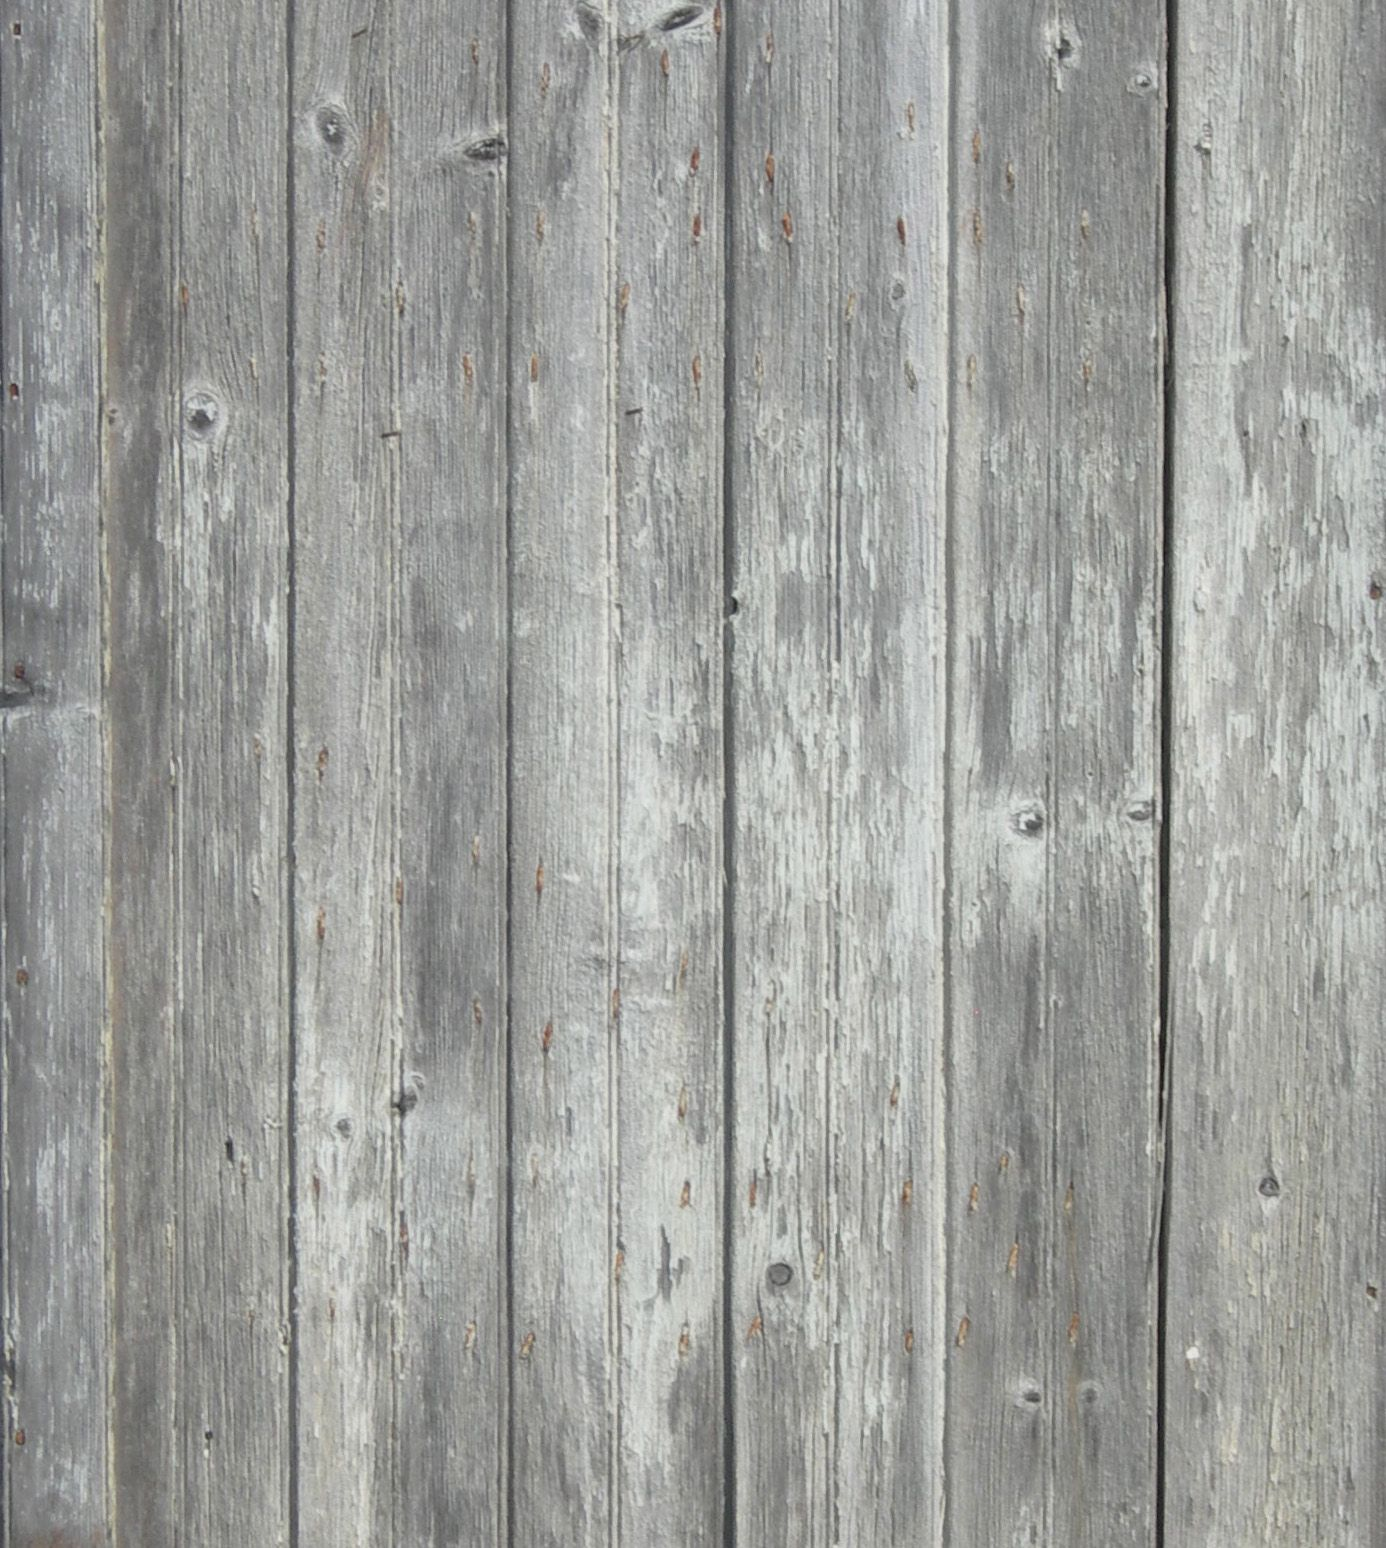 Grey Weathered Wood Grey November Is National Diabetes